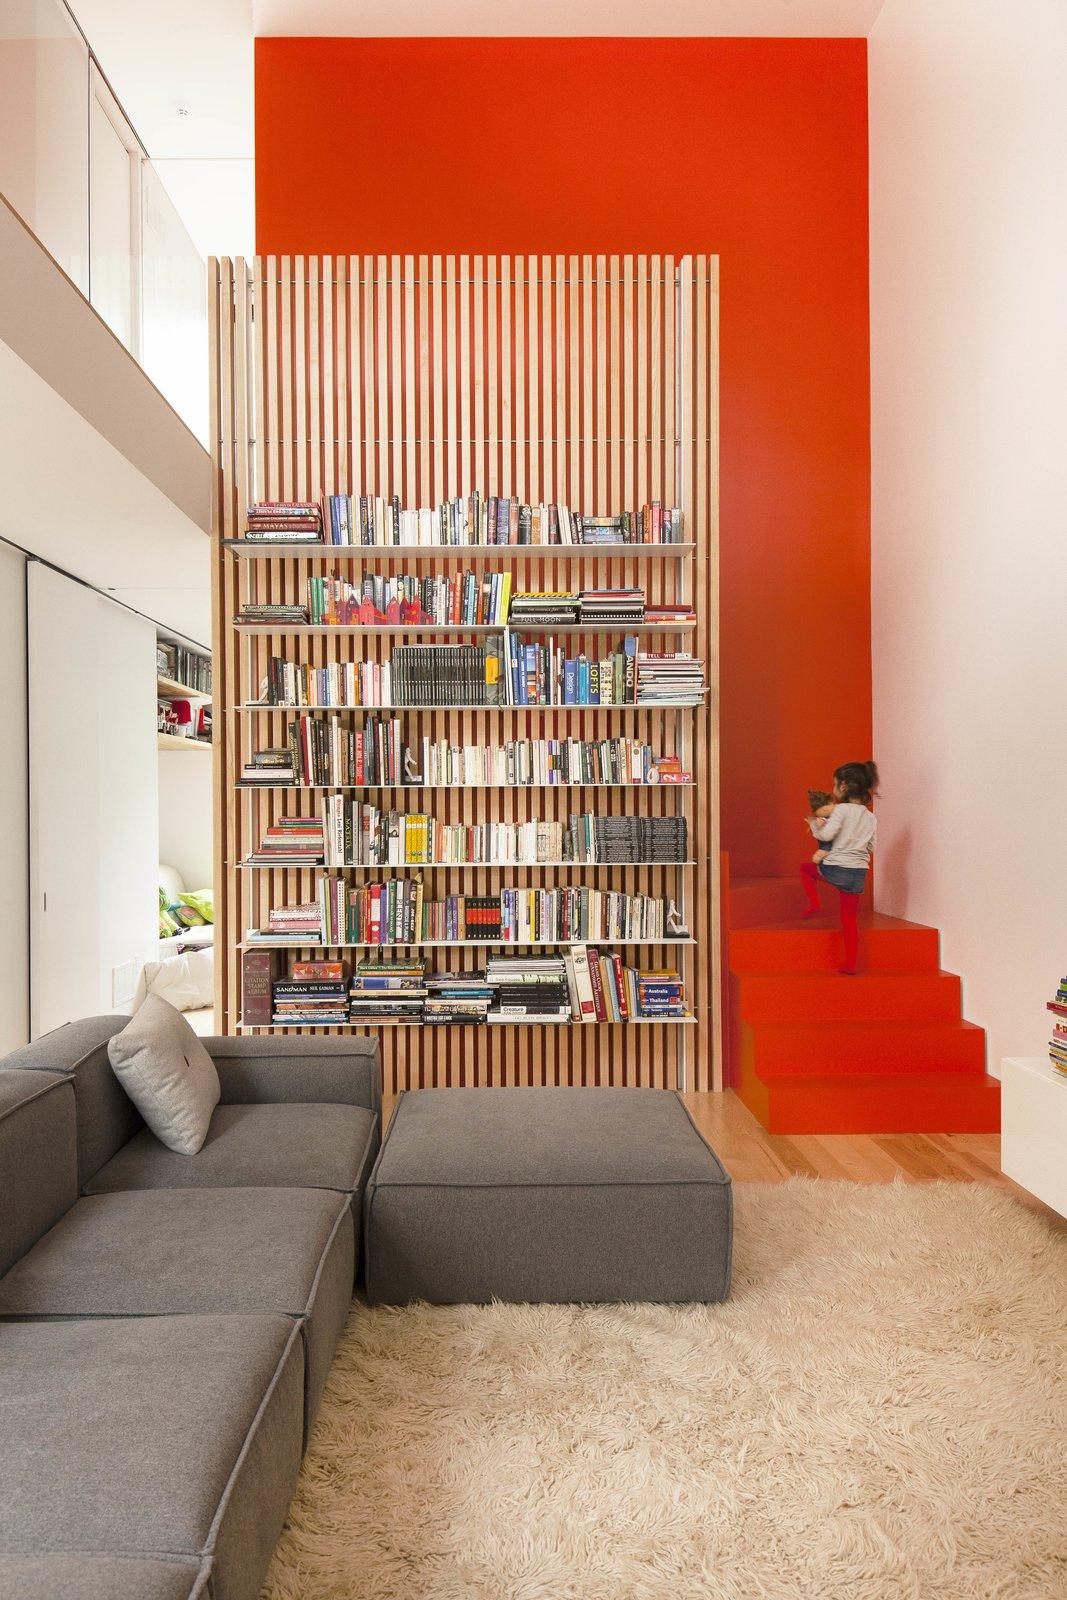 #color #livingroom #red #staircase #bookshelf #Montreal #Canada #LaSHEDArchitecture